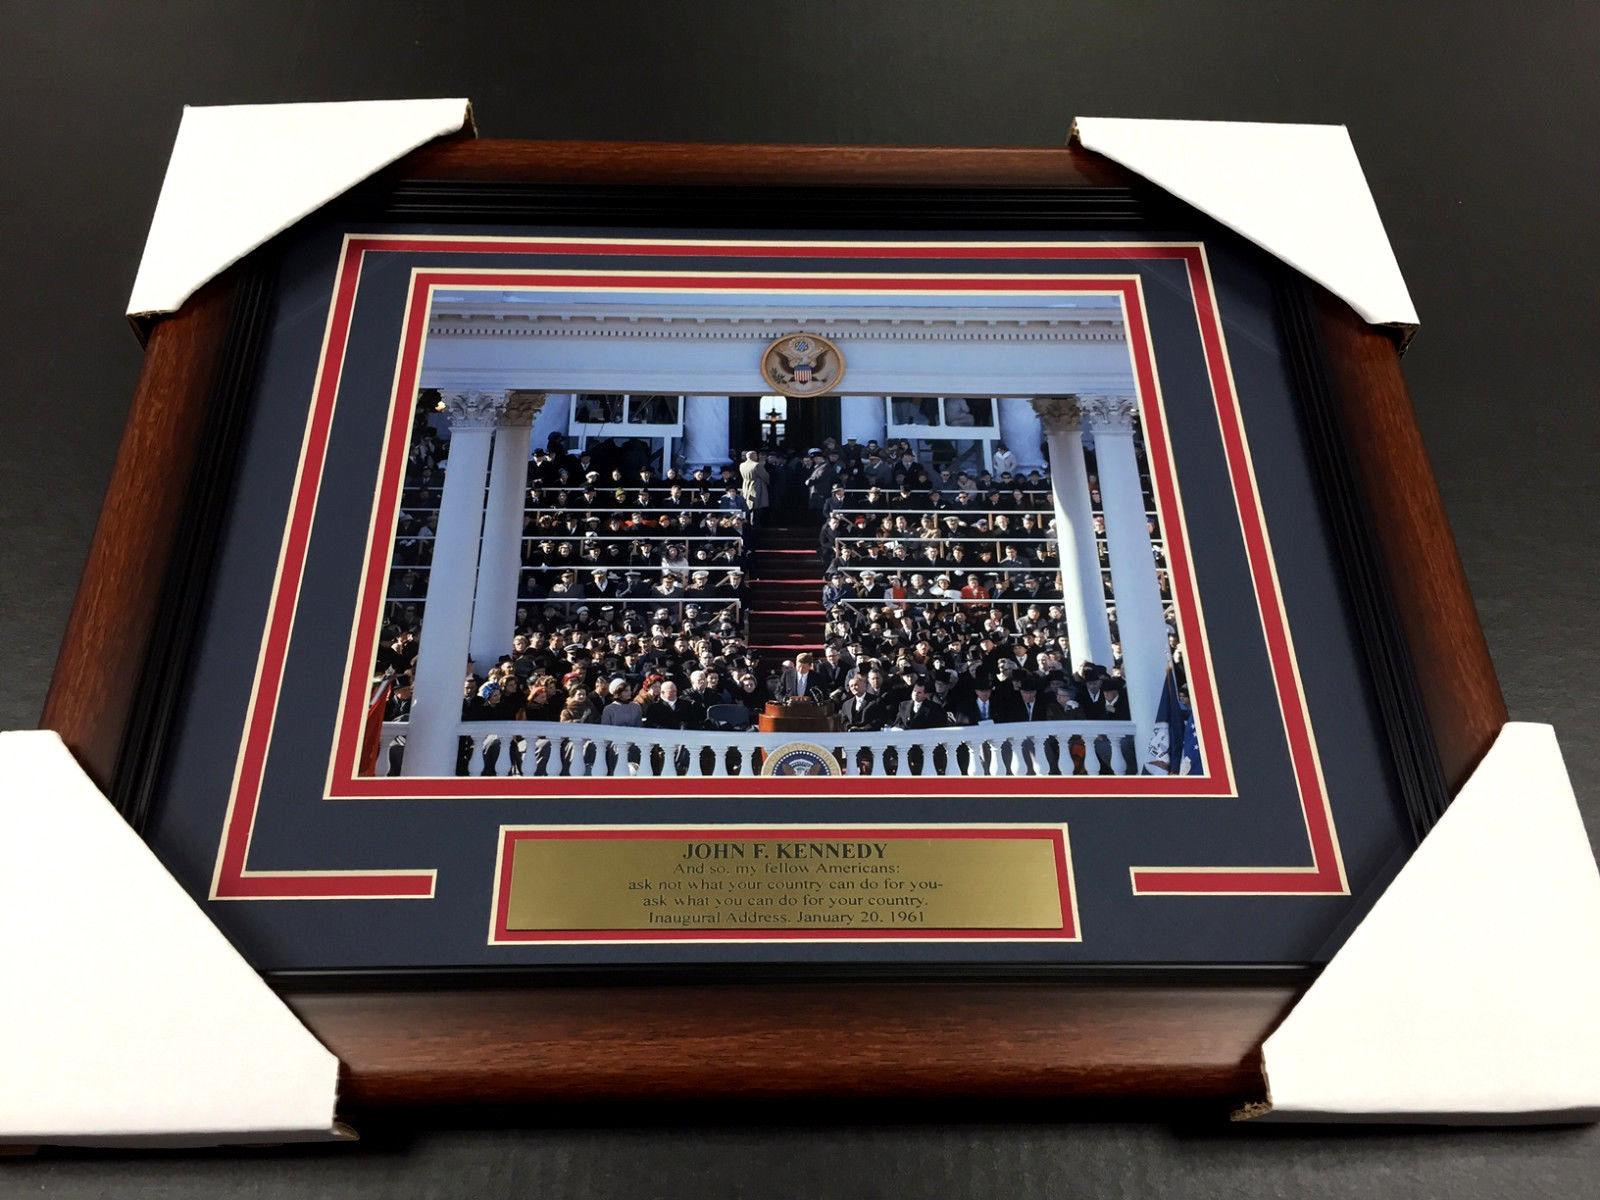 John F Kennedy United States President Inaugural Address